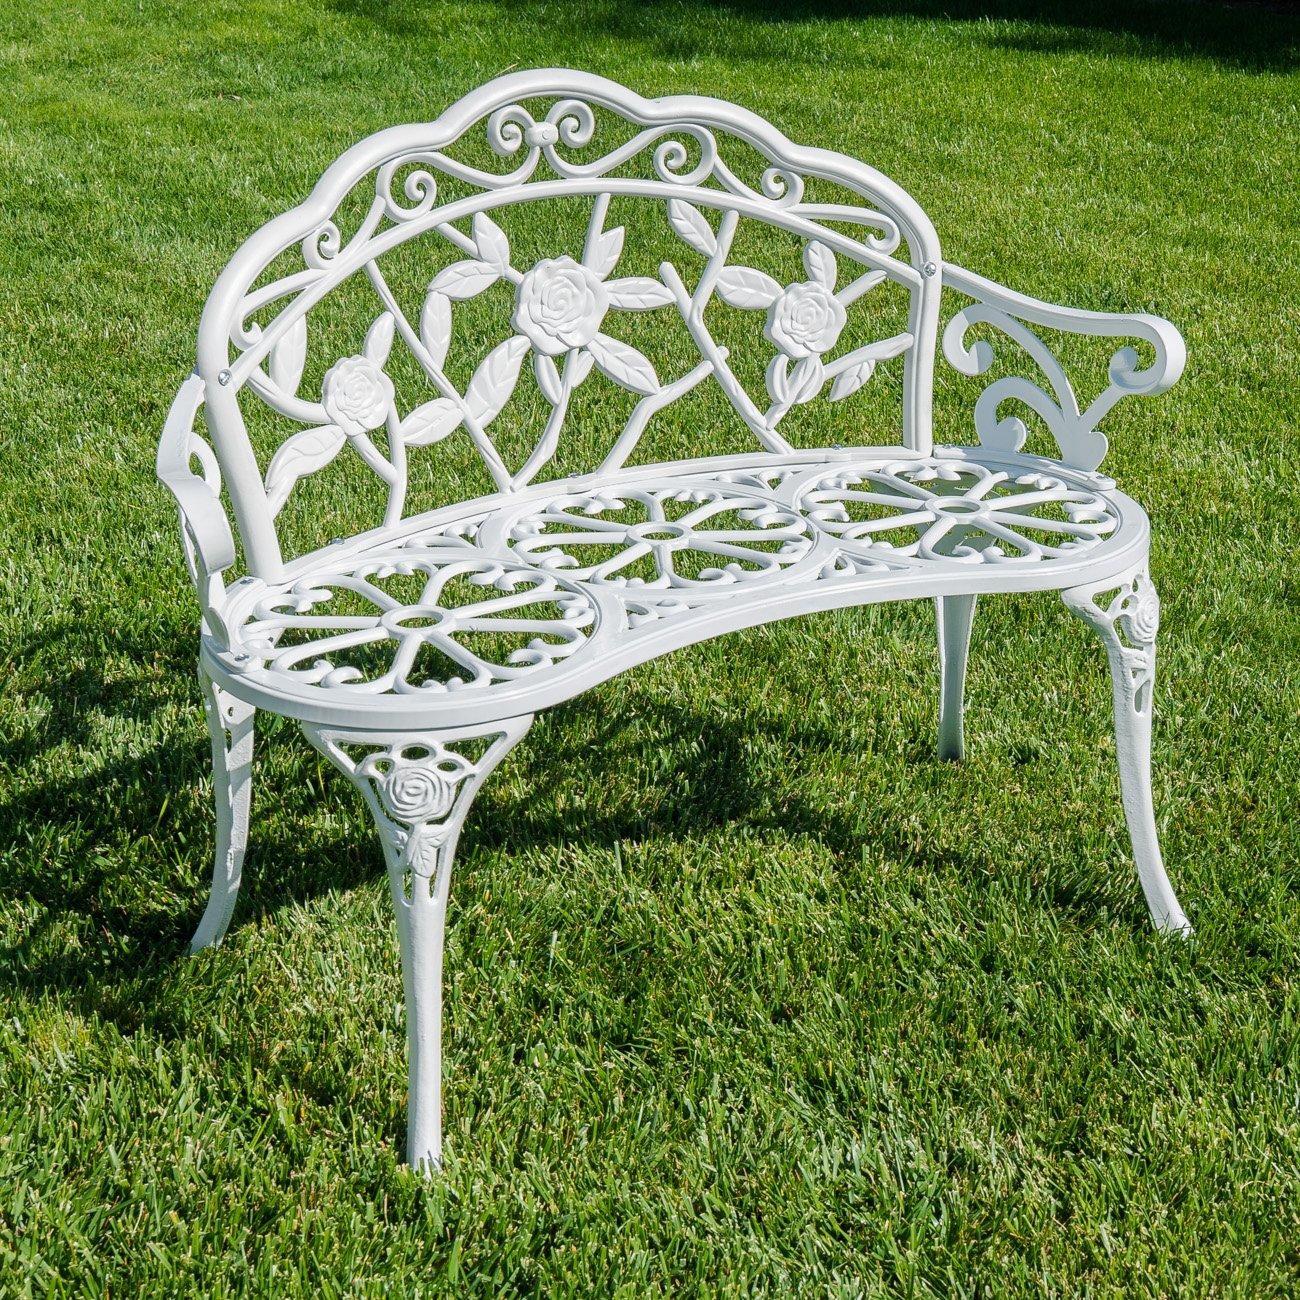 BELLEZE Rose Style Love Seat Bench White Cast Iron Antique Designed Outdoor Patio Porch Home Garden Parks Backyard Pool